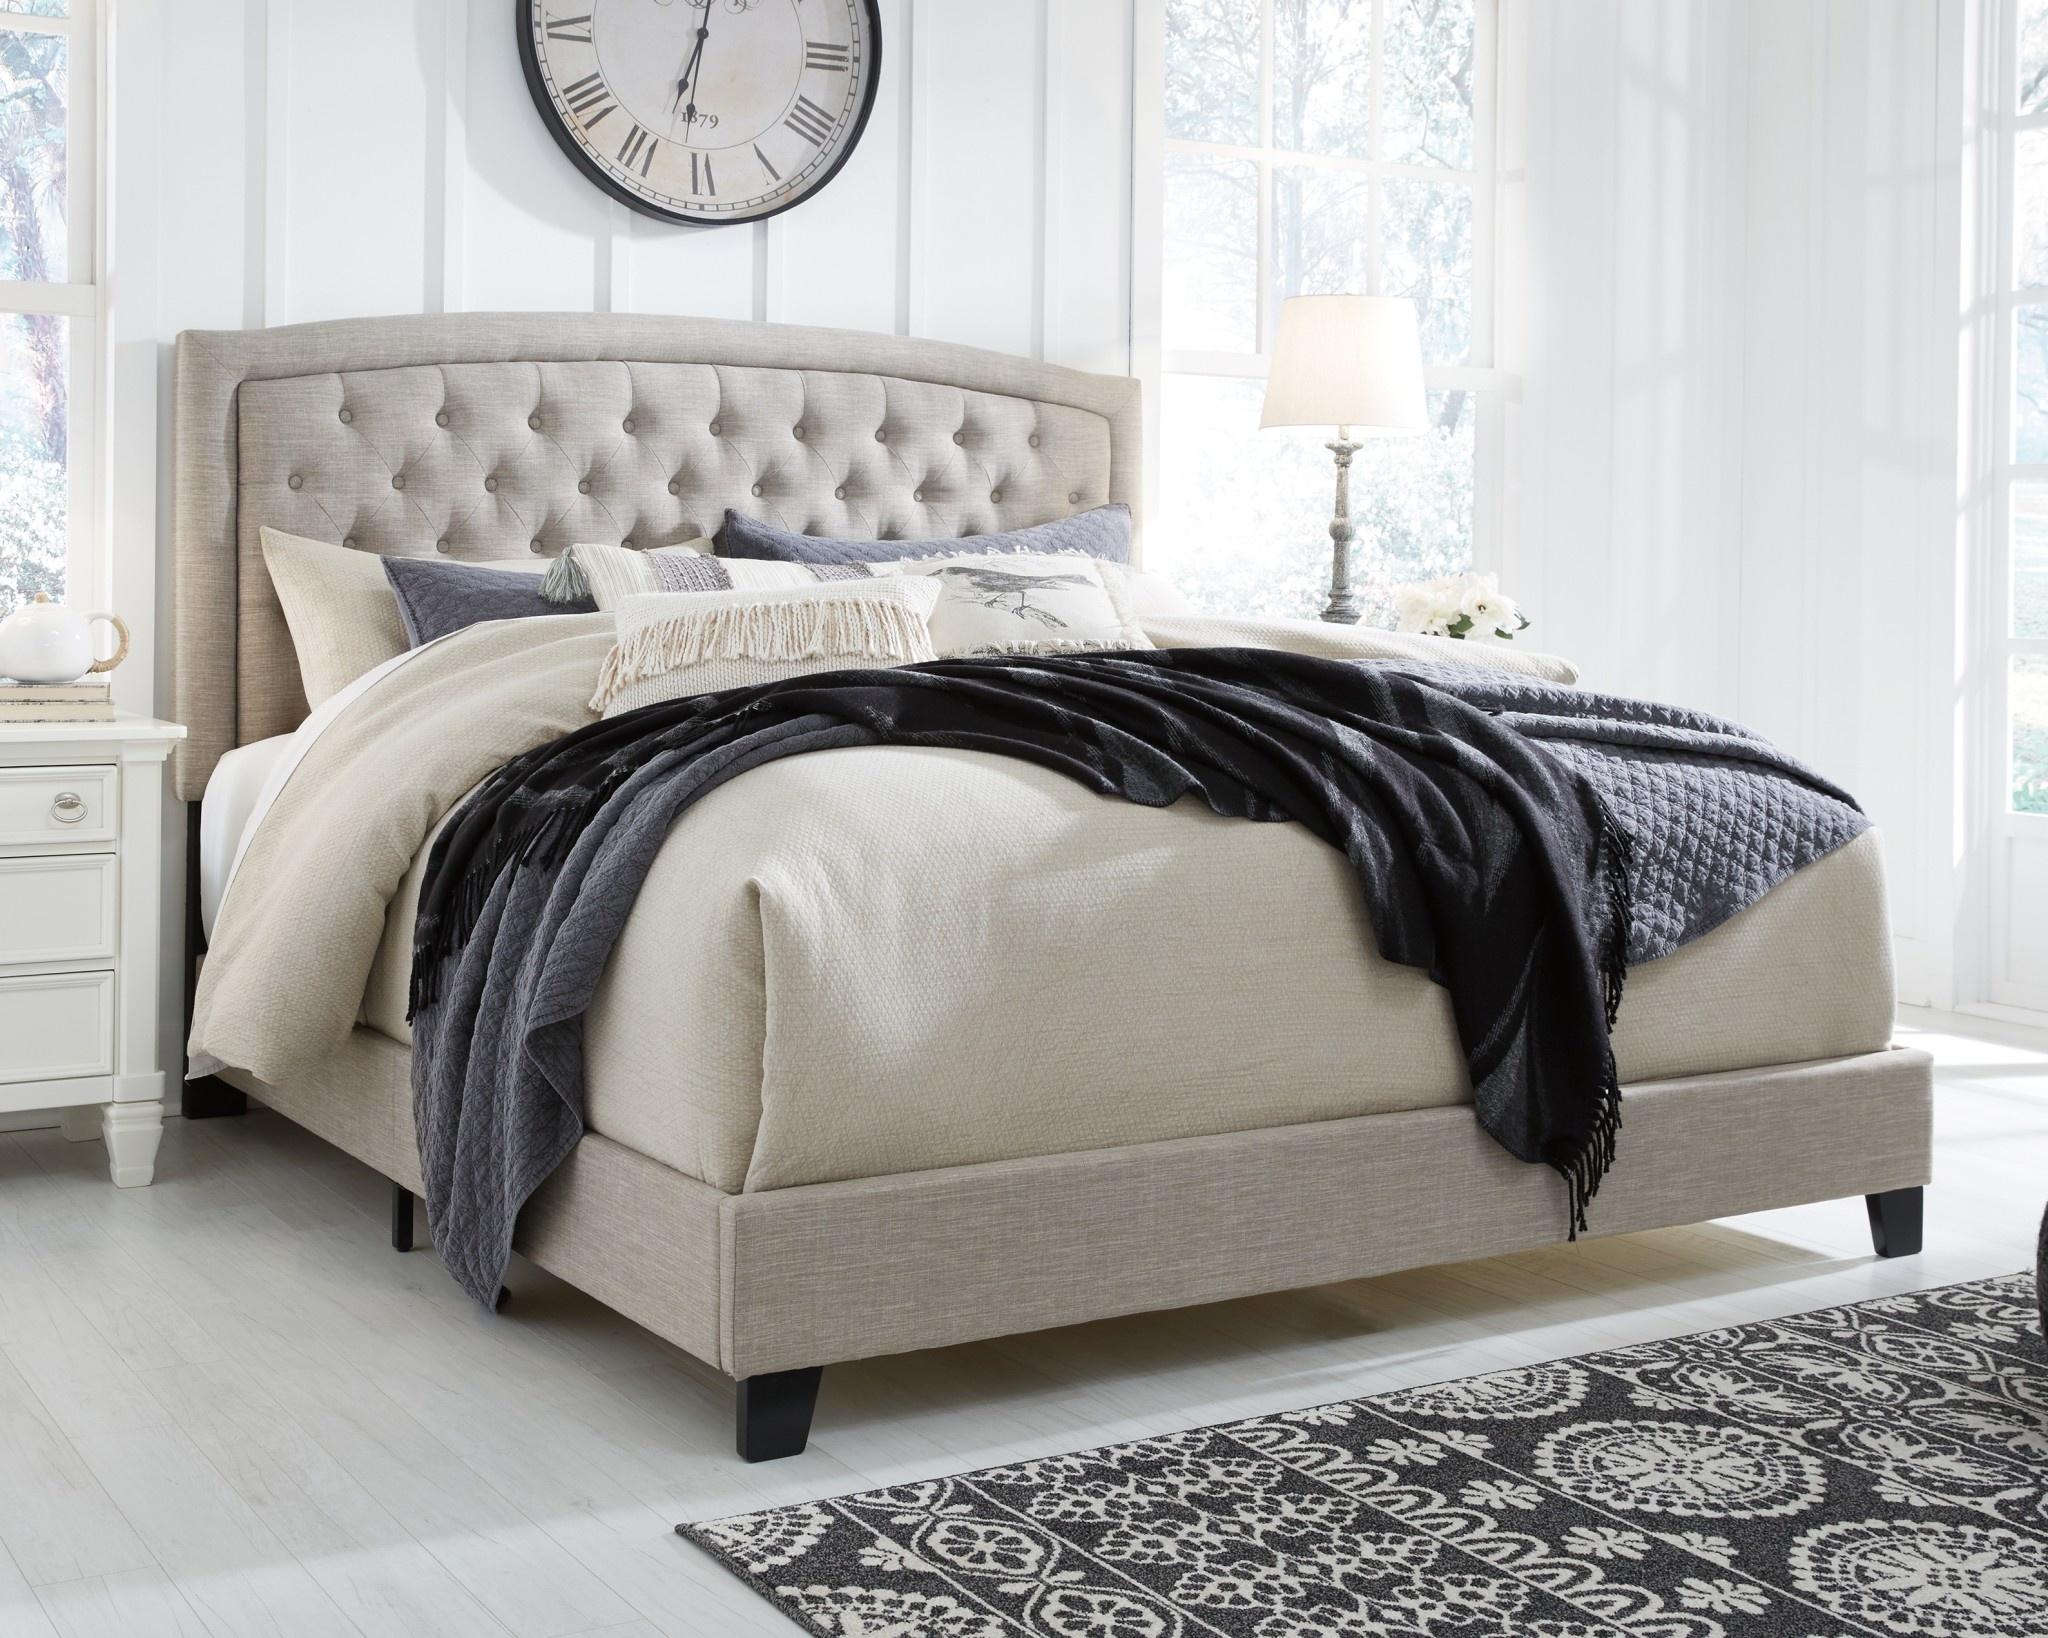 Signature Design Jerary- Light Gray KING Upholstered Bed- B090-782